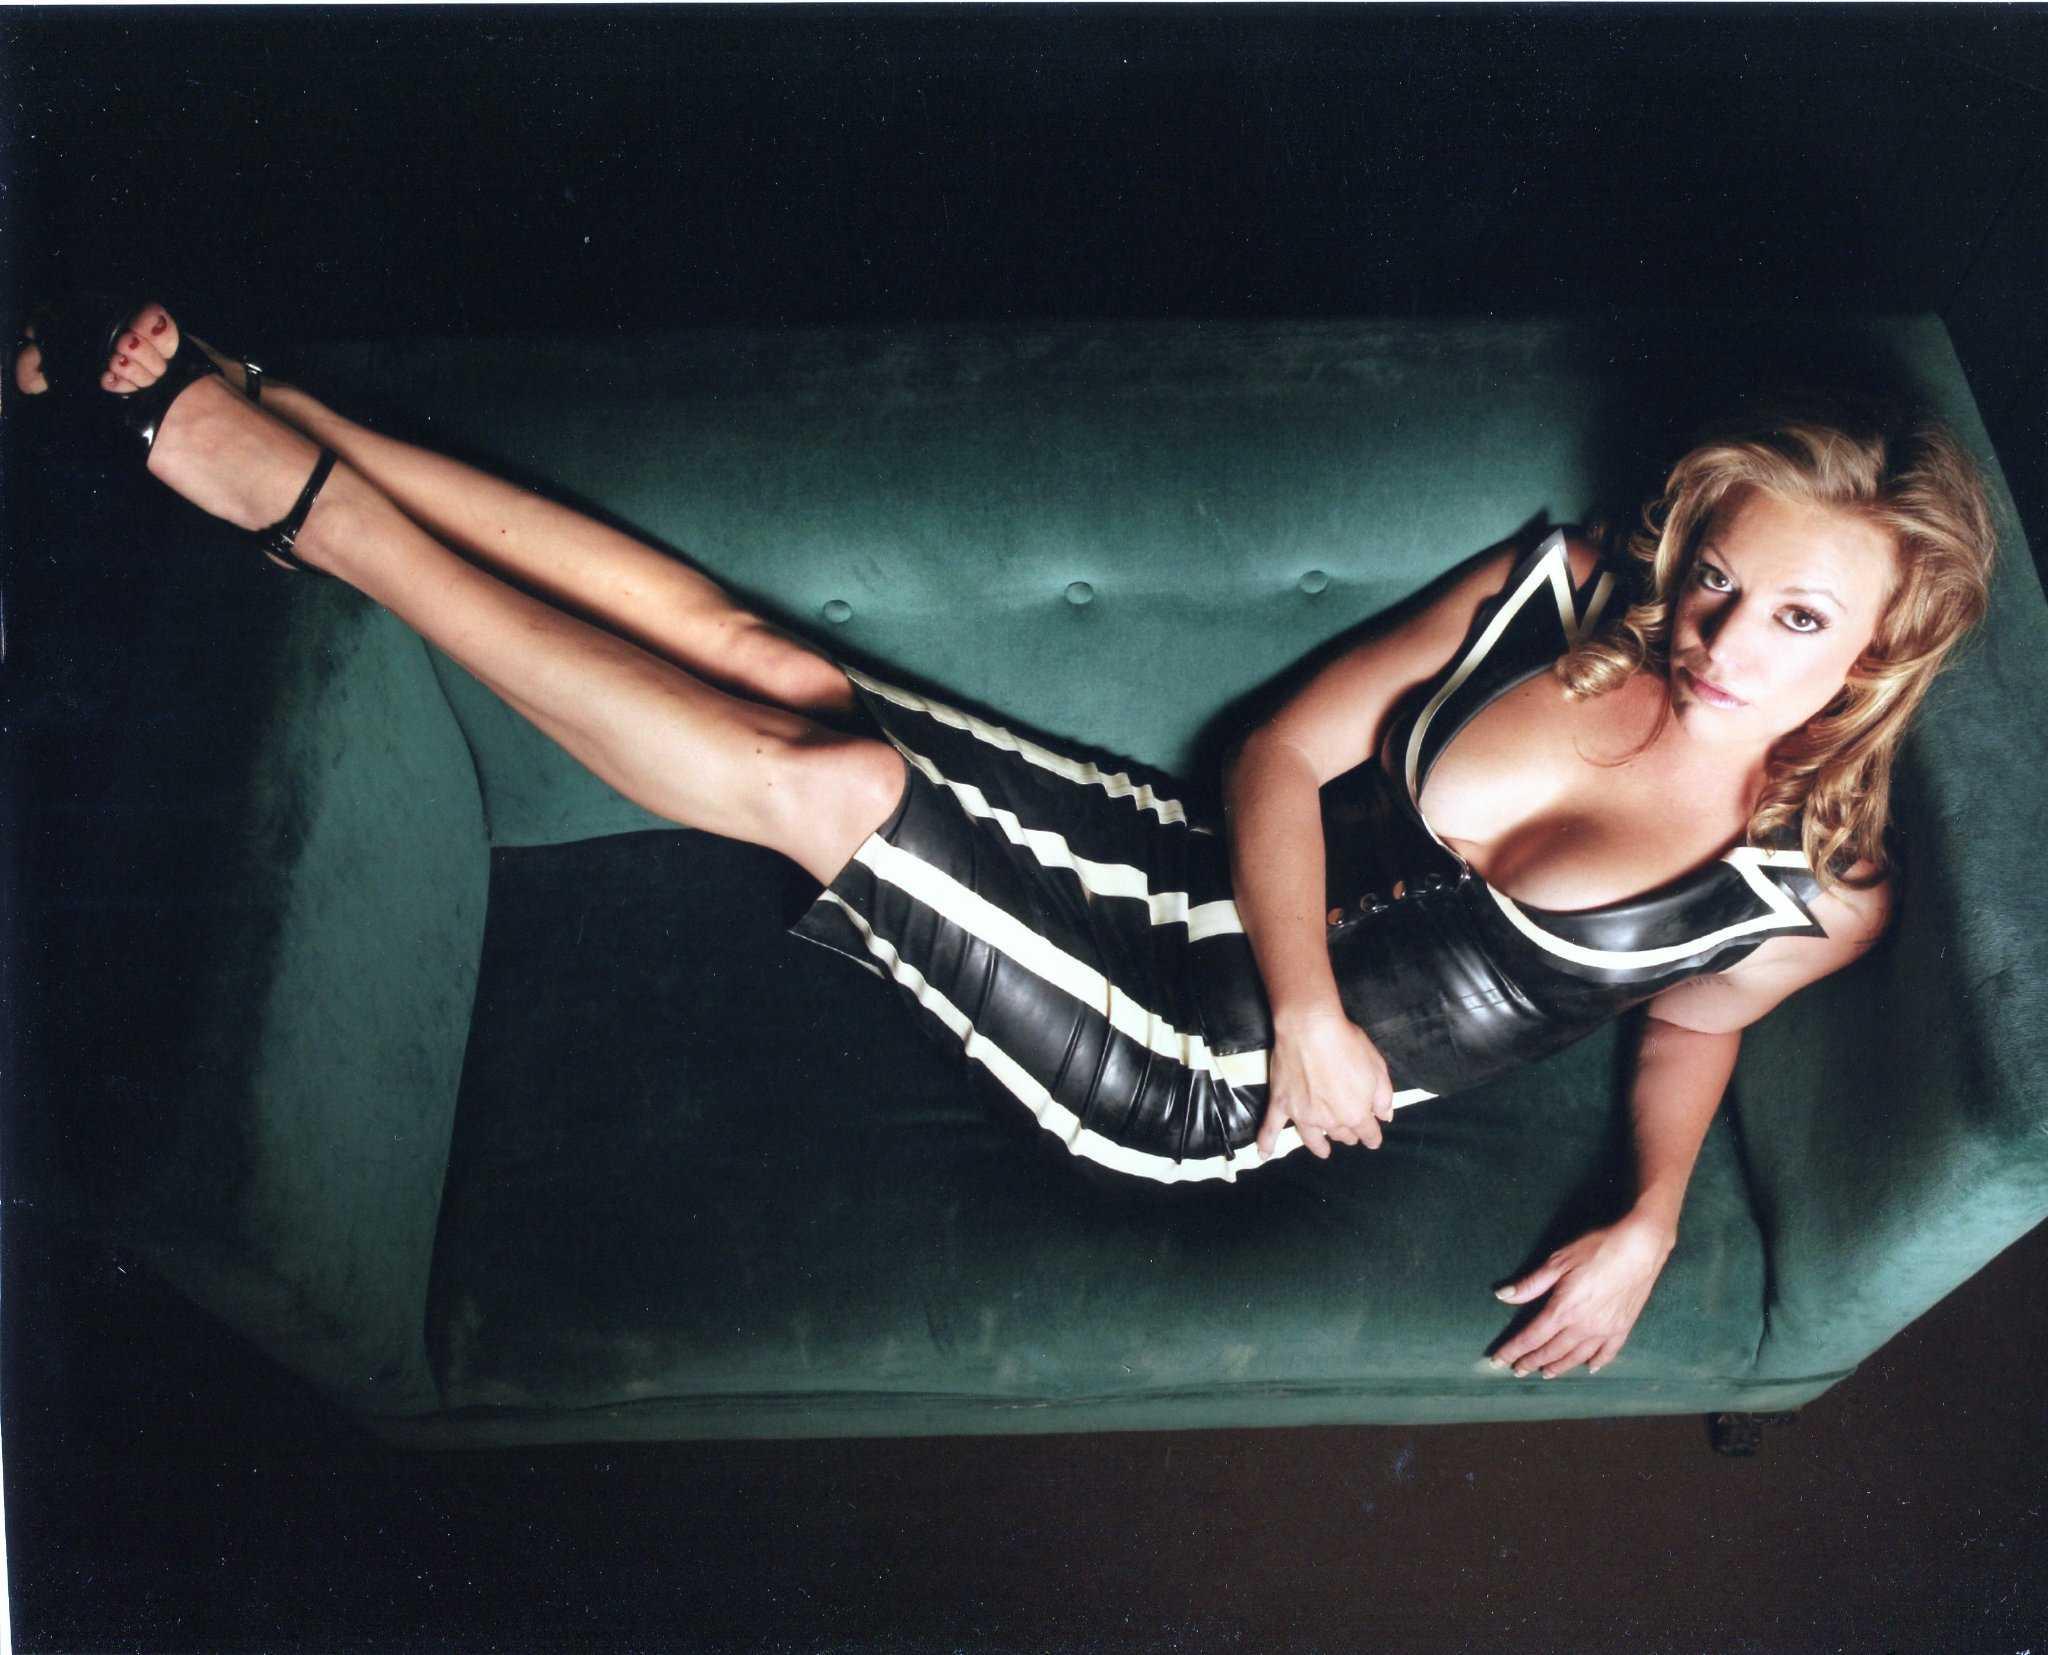 Mistress Corinne